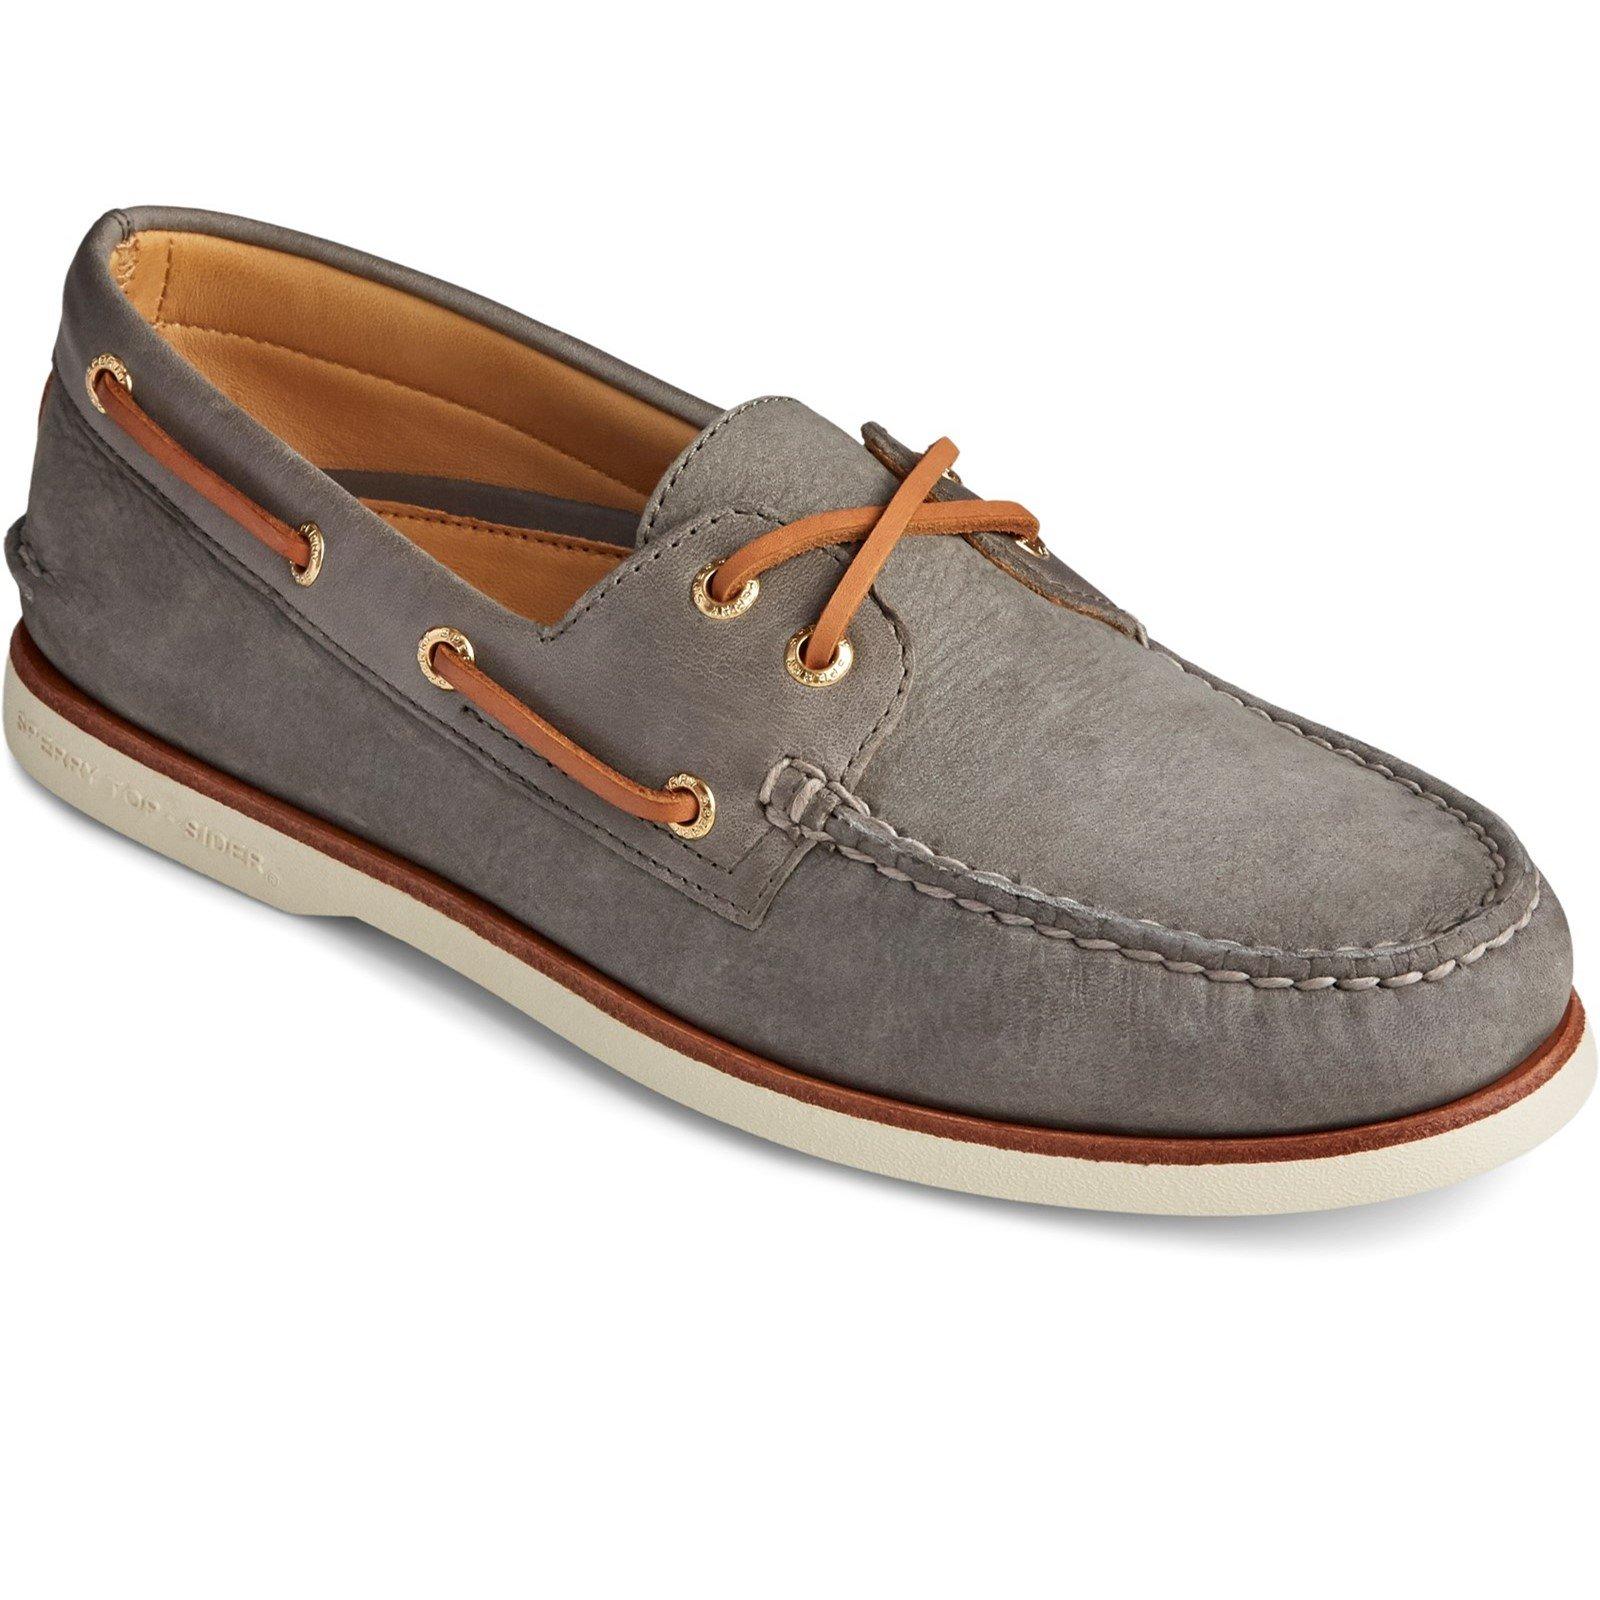 Sperry Men's Authentic Original Seaside Boat Shoe Grey 31529 - Grey 8